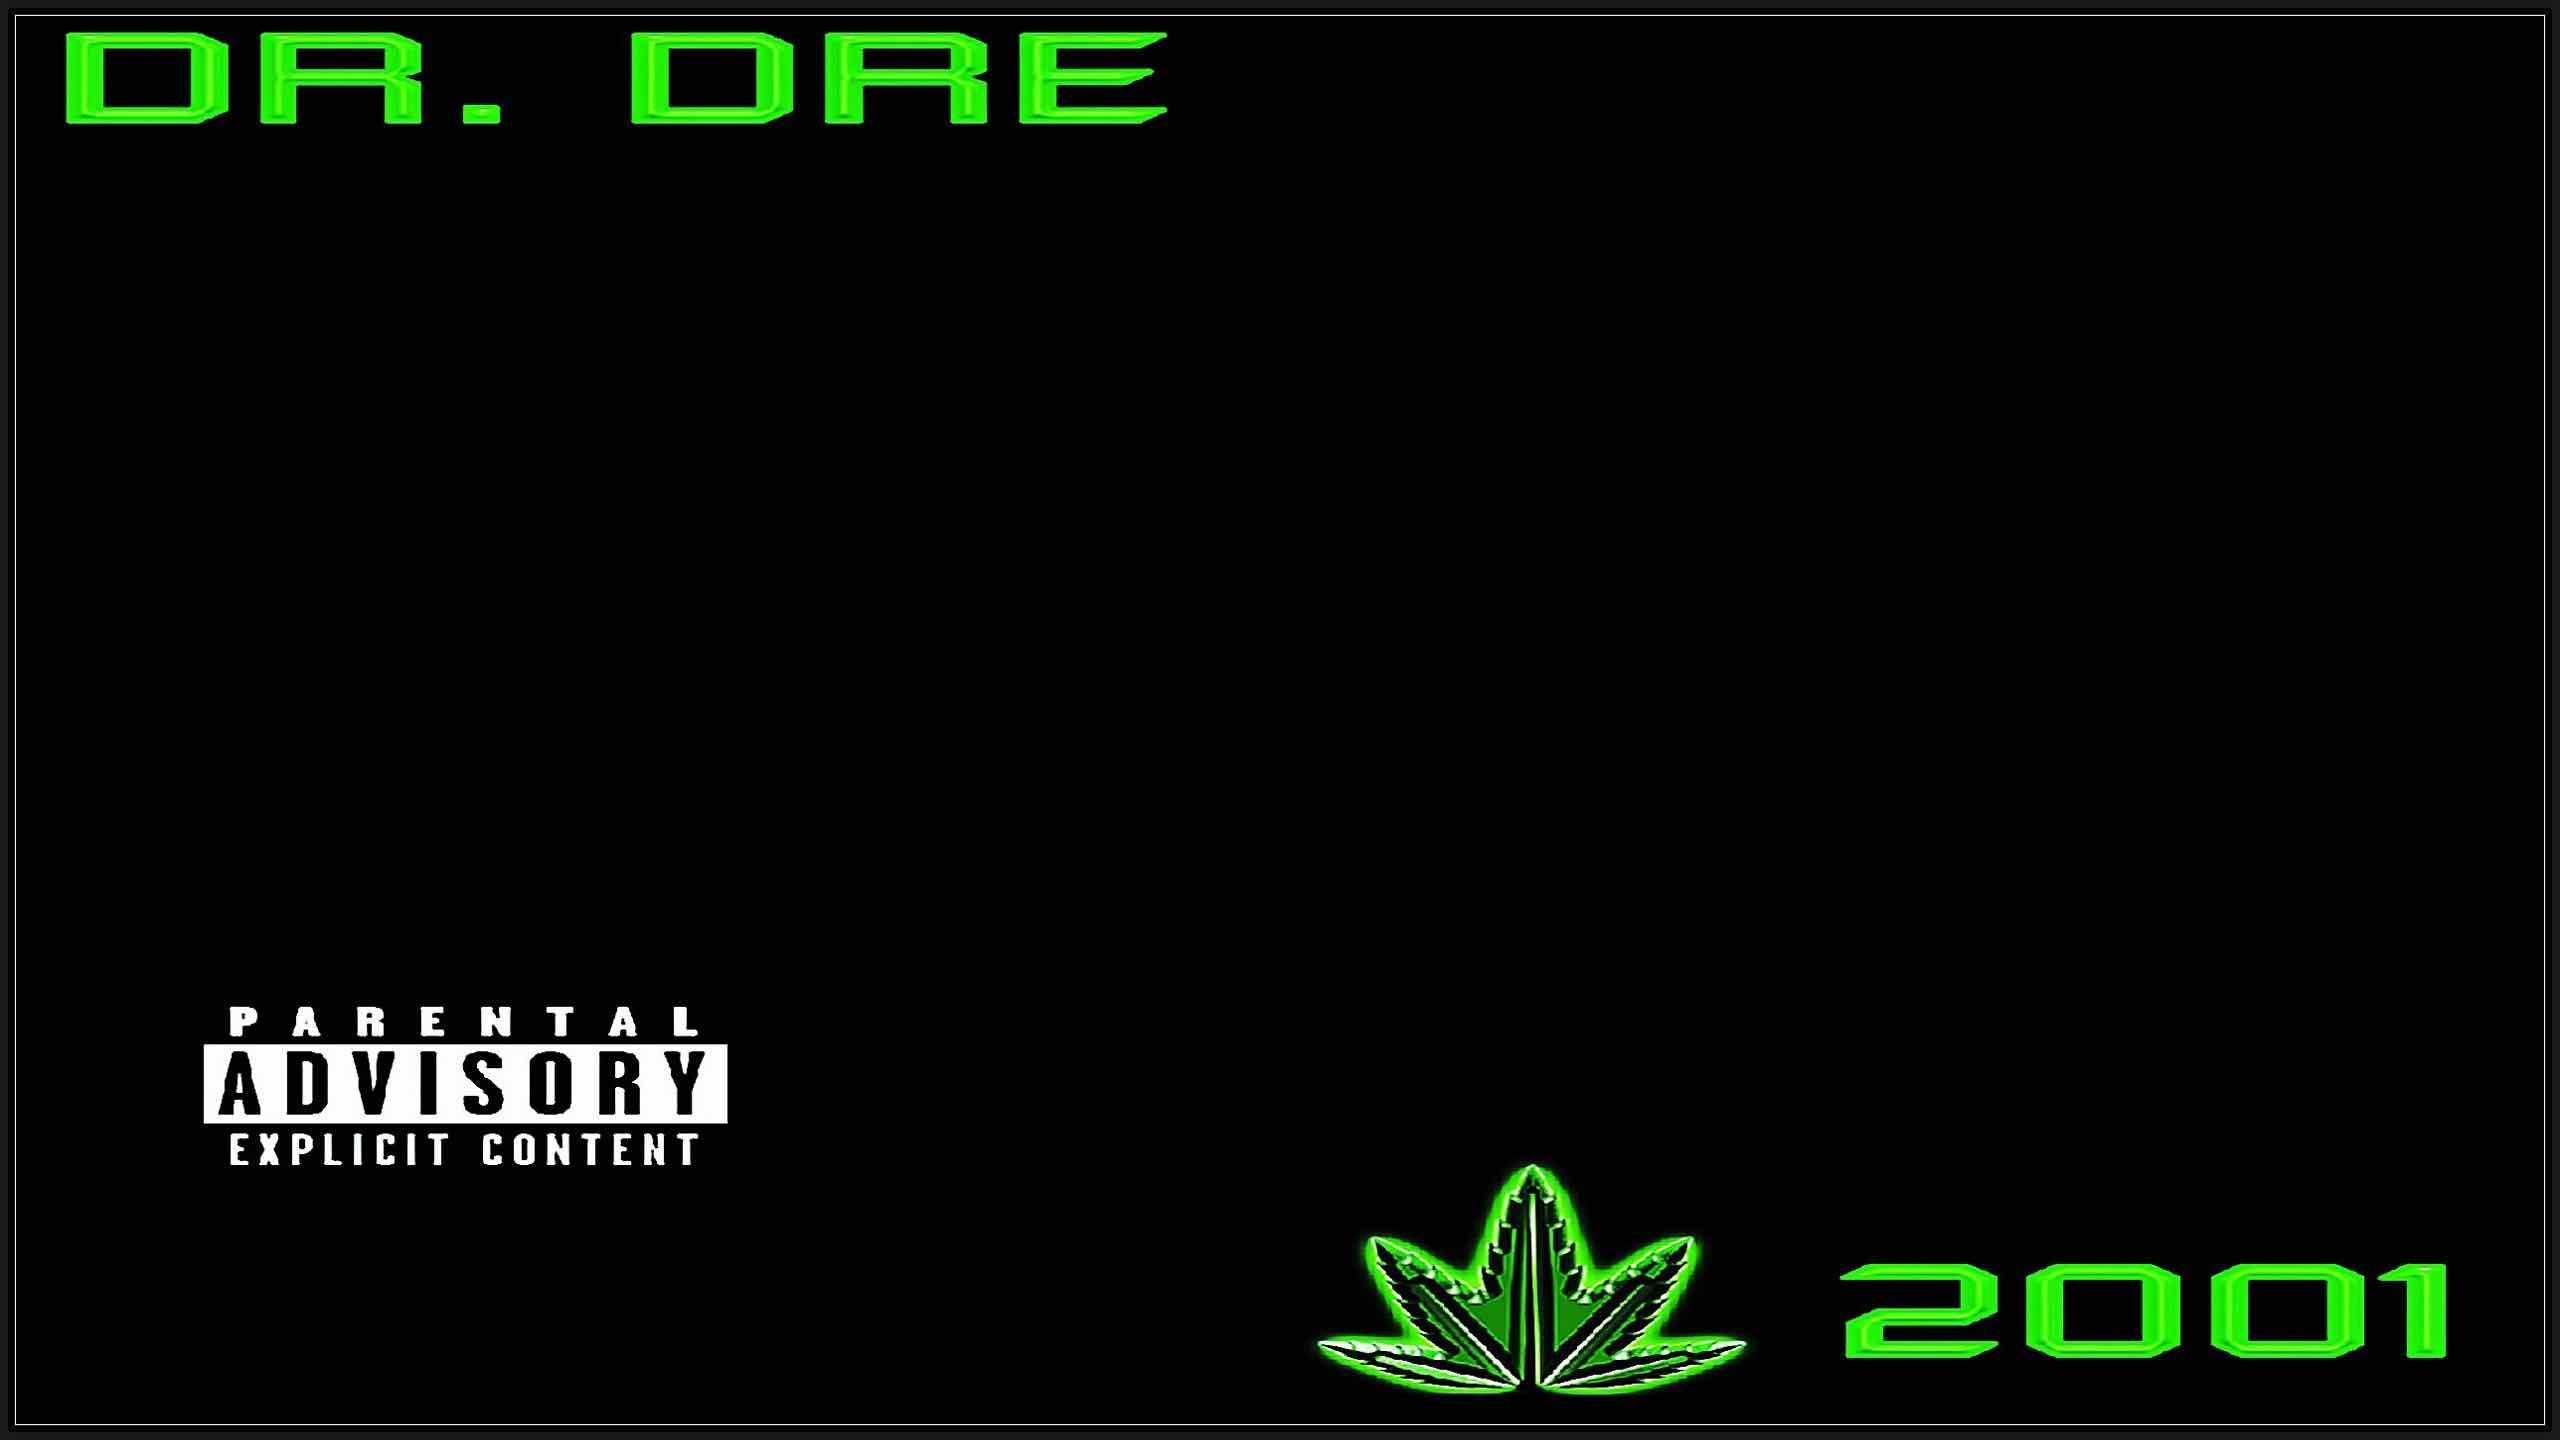 dr-dre-2001-full-album